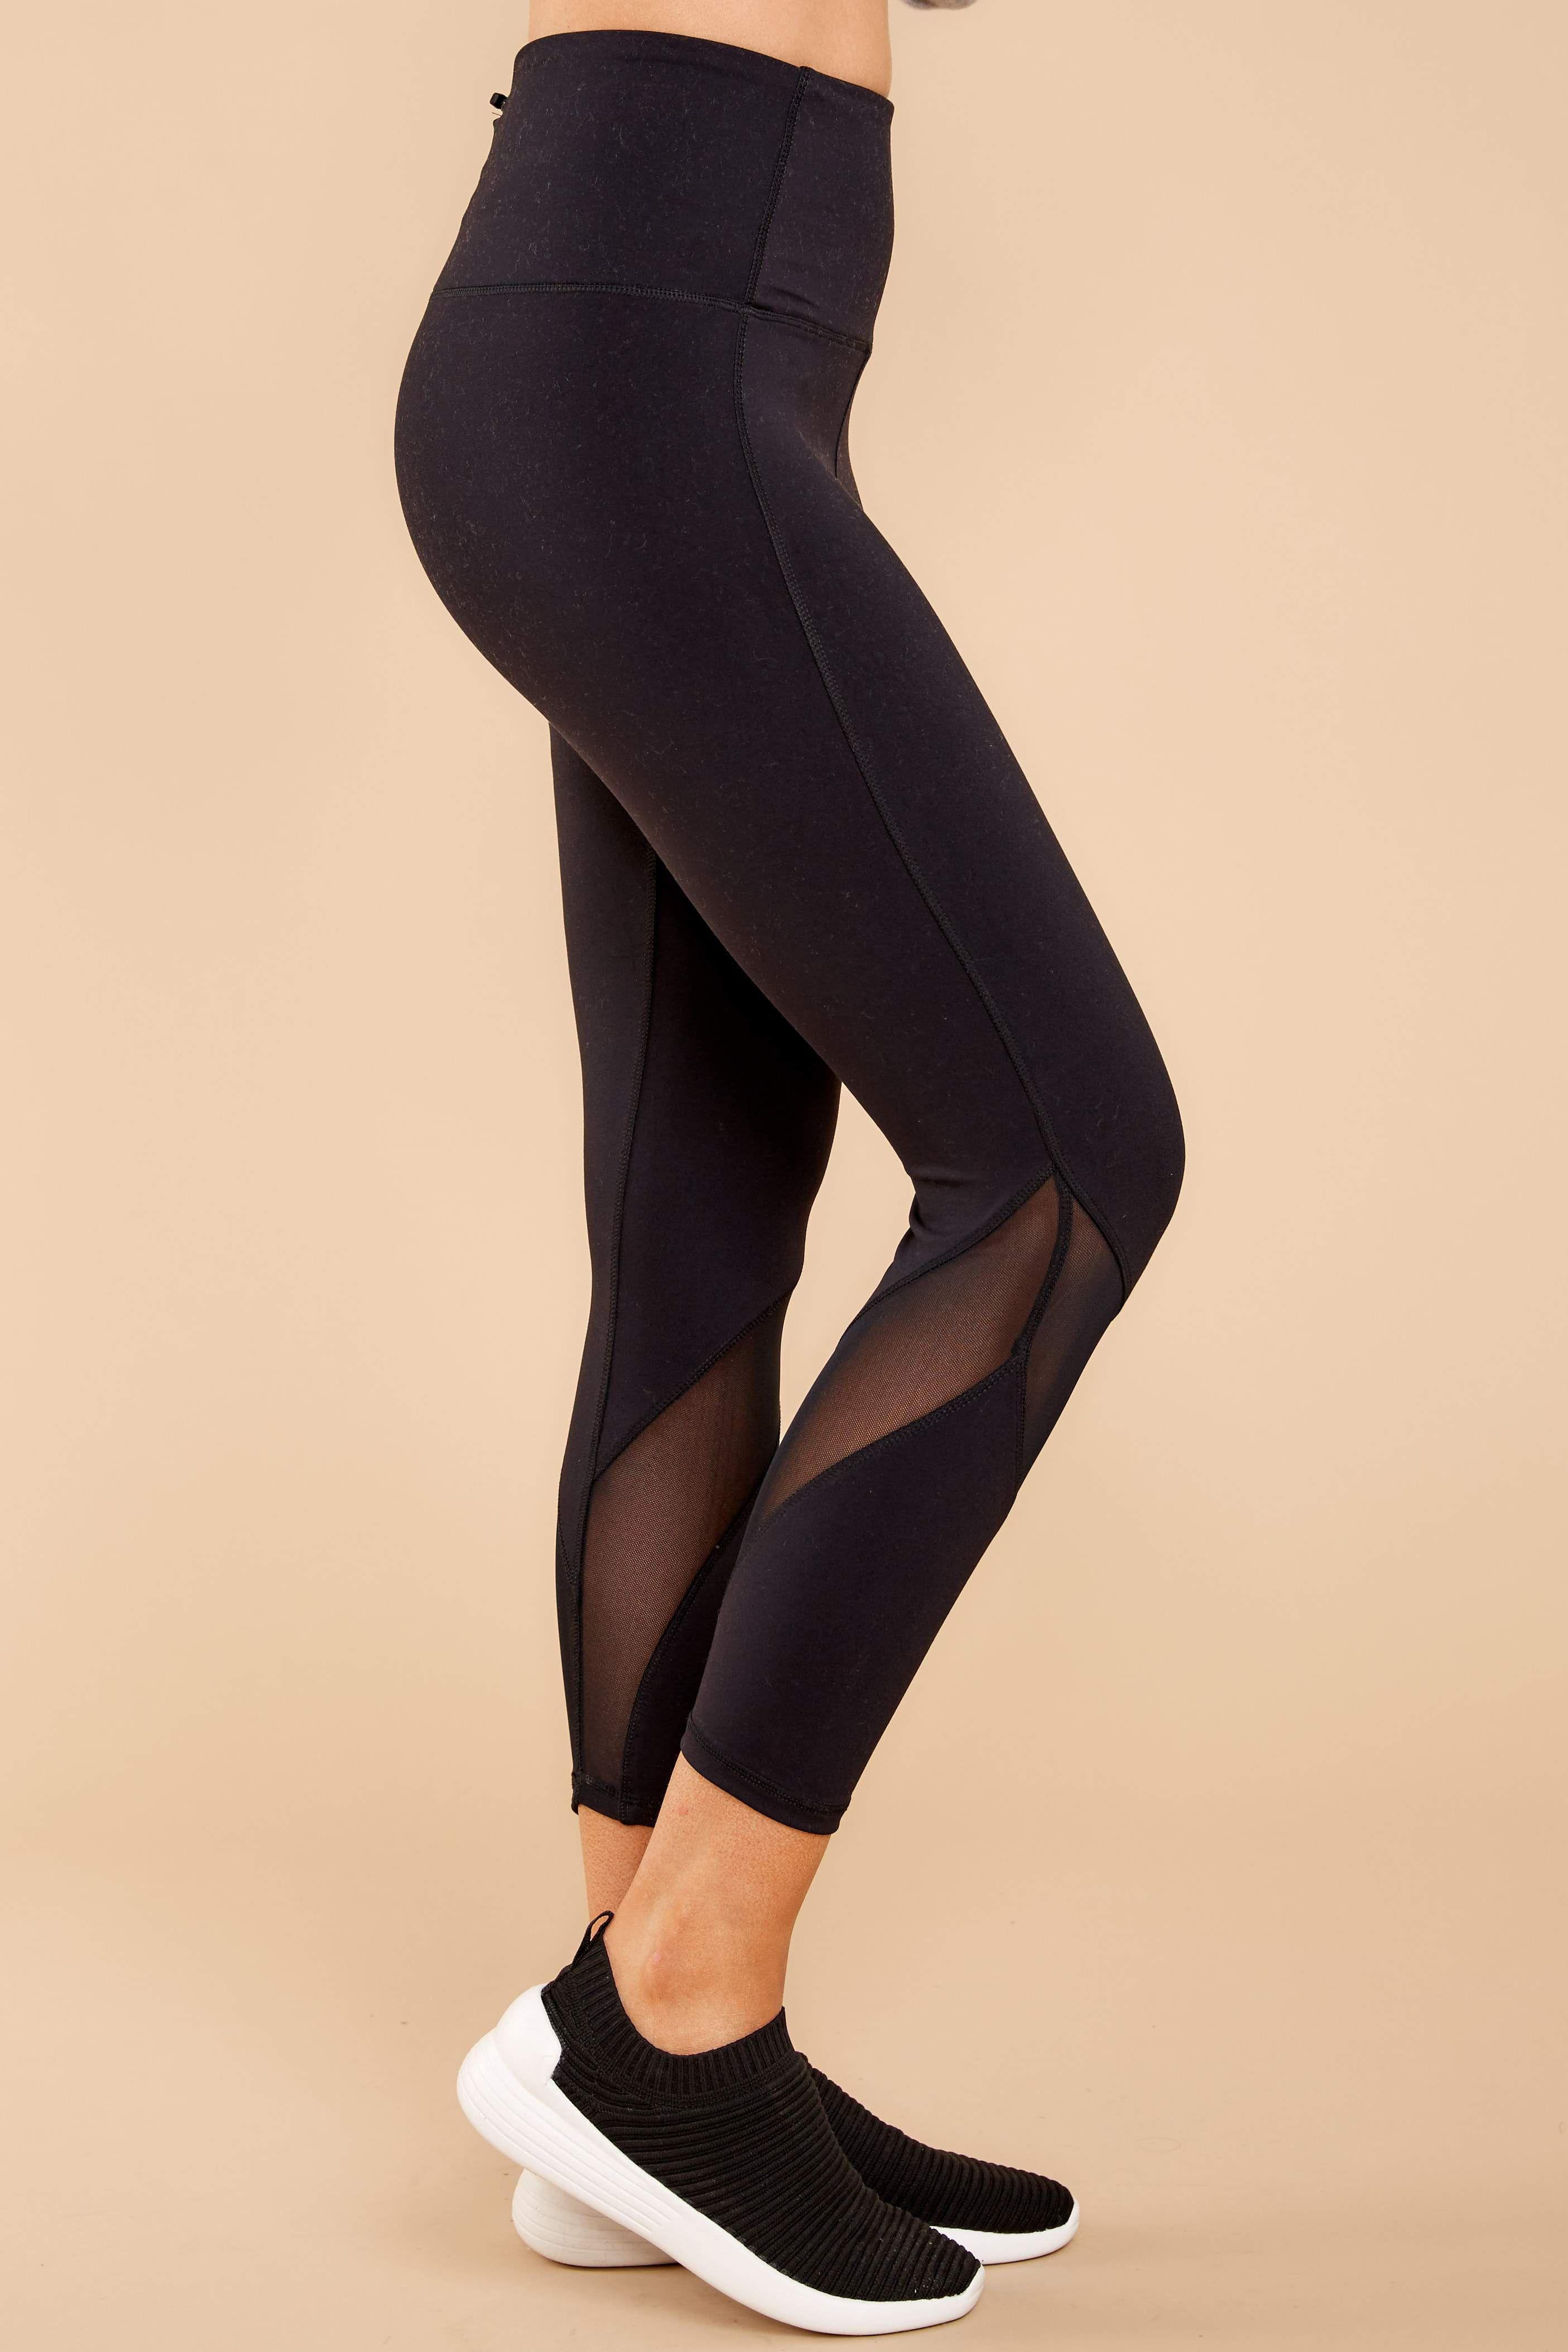 c113687f71344 Cute Black Leggings - Trendy Leggings - Leggings - $29.00 – Red Dress  Boutique